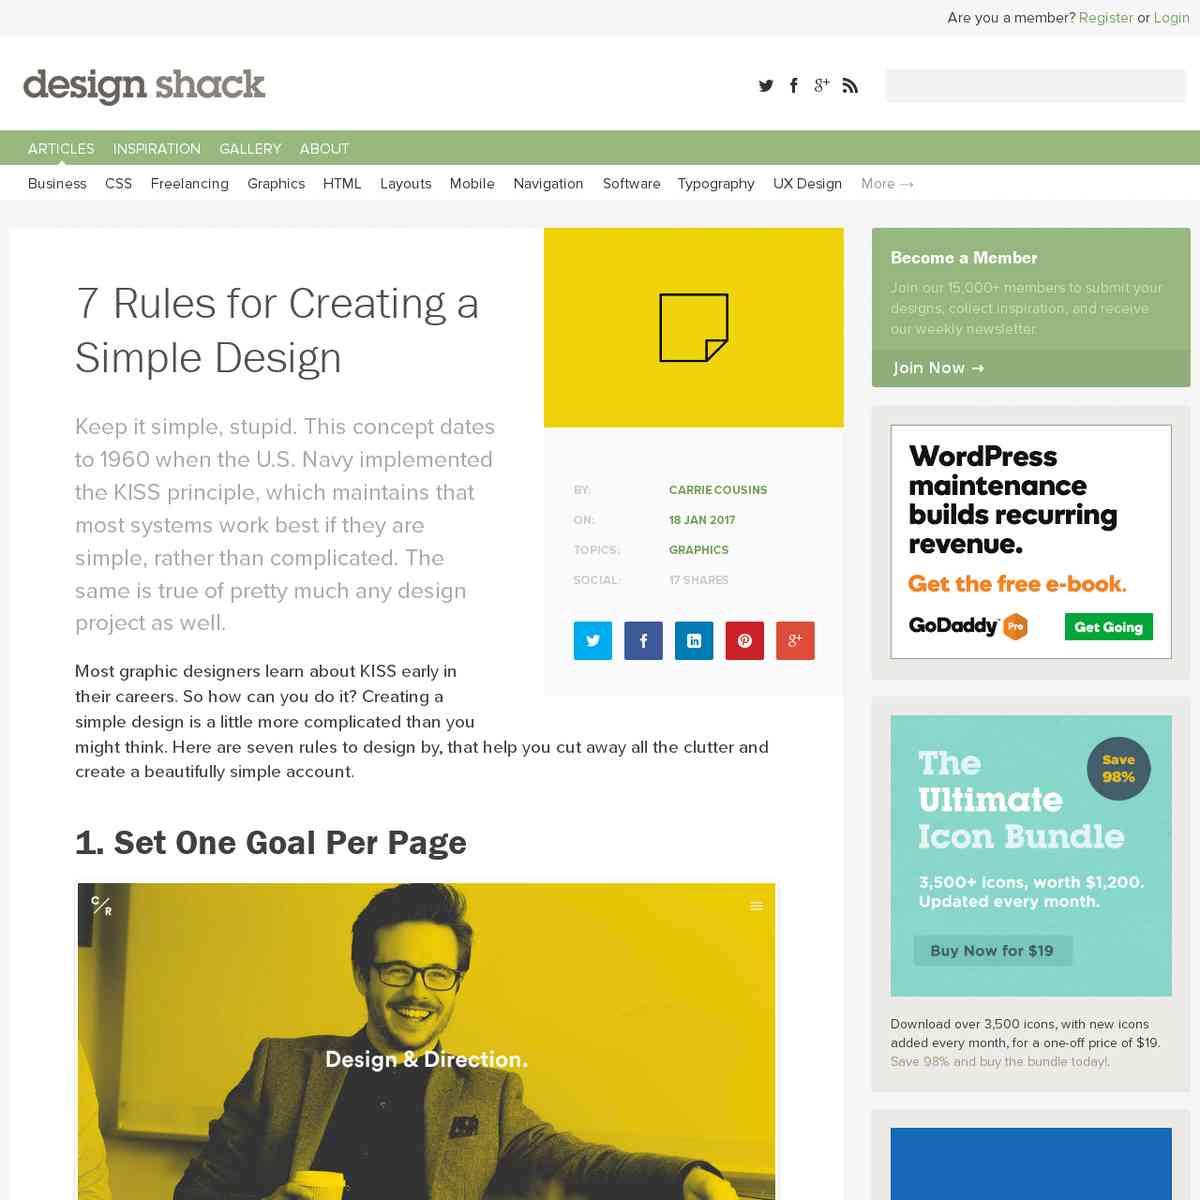 designshack.net/articles/graphics/7-simple-design-rules/